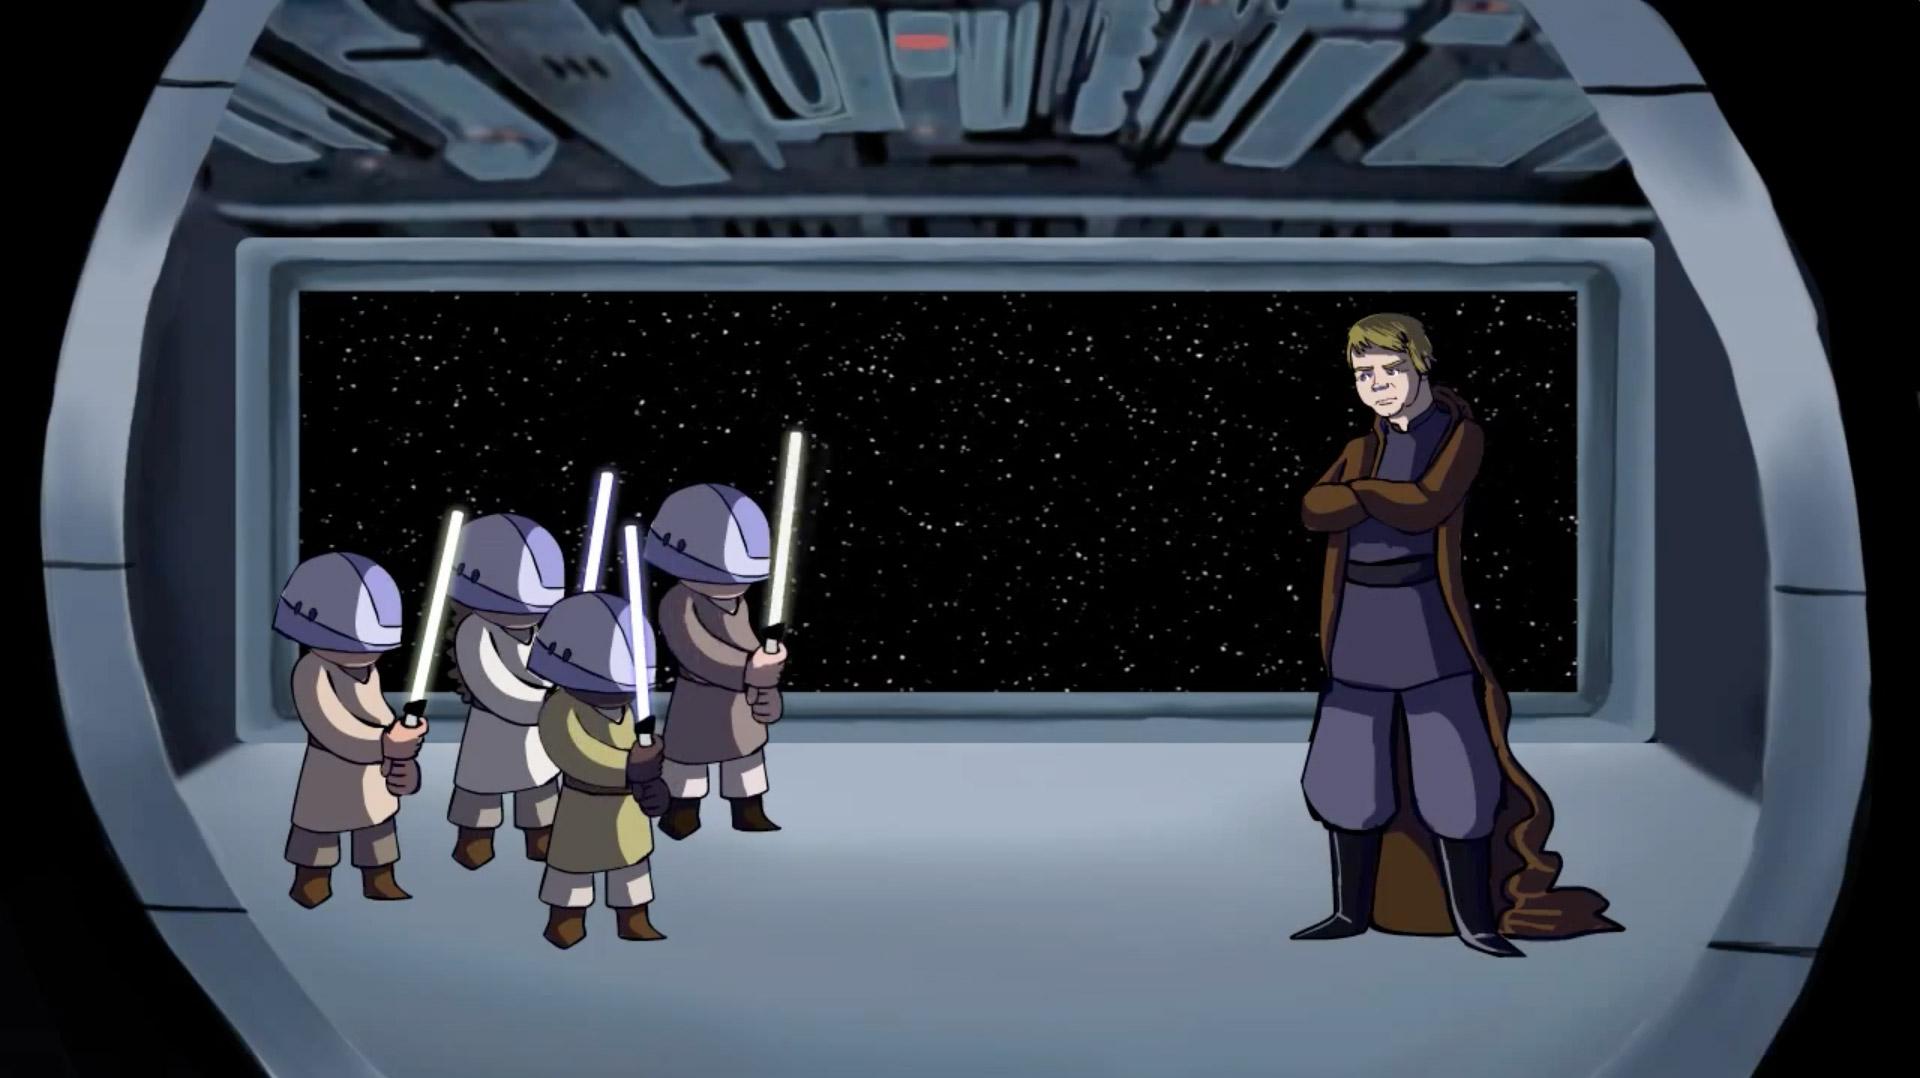 patton-oswalts-star-wars-fillbuster-gets-animated-3.jpg